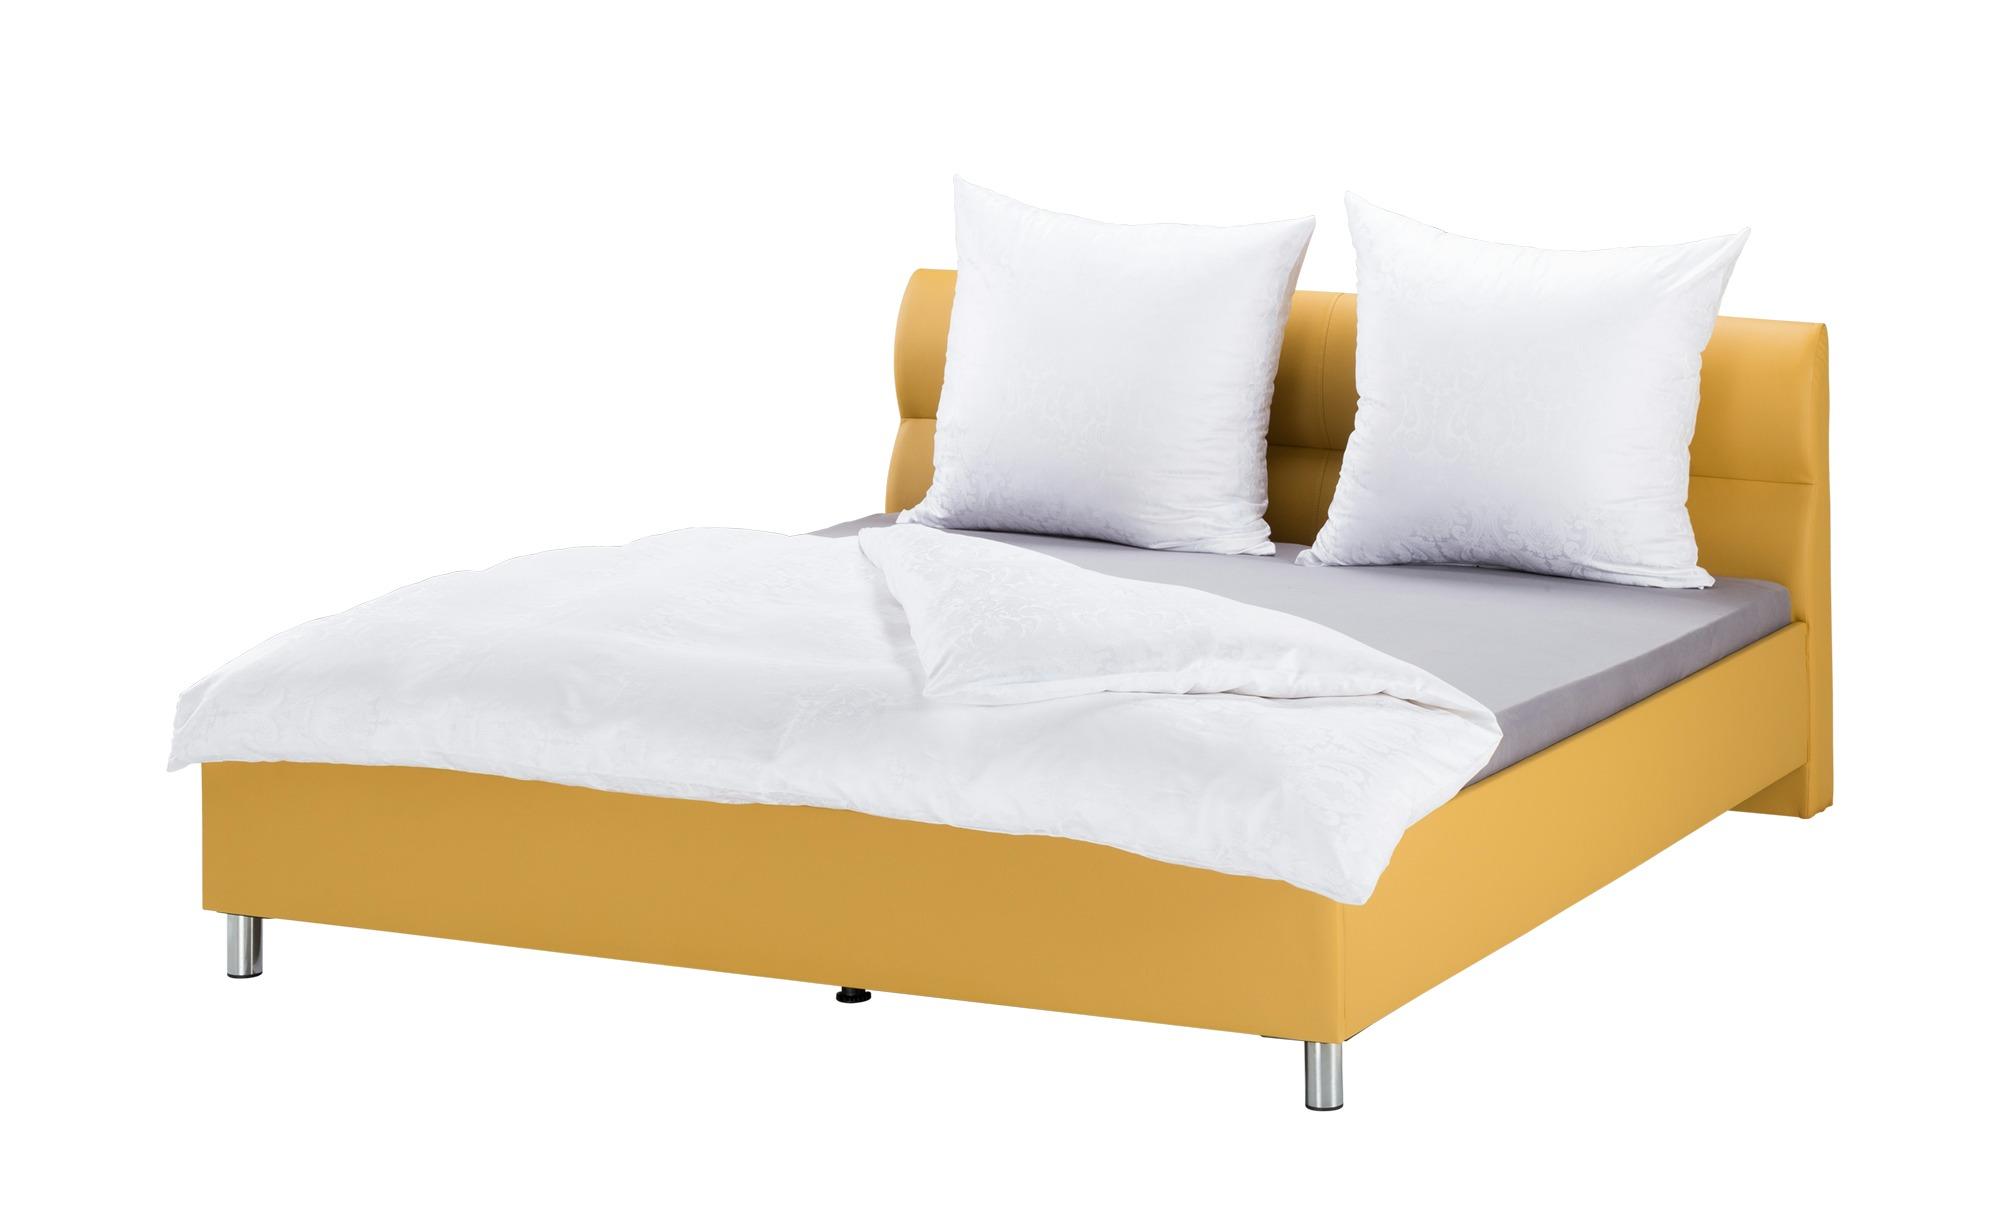 Polsterbettgestell 180x200 - gelb Bereni ¦ gelb ¦ Maße (cm): B: 186 Betten > Polsterbetten - Höffner